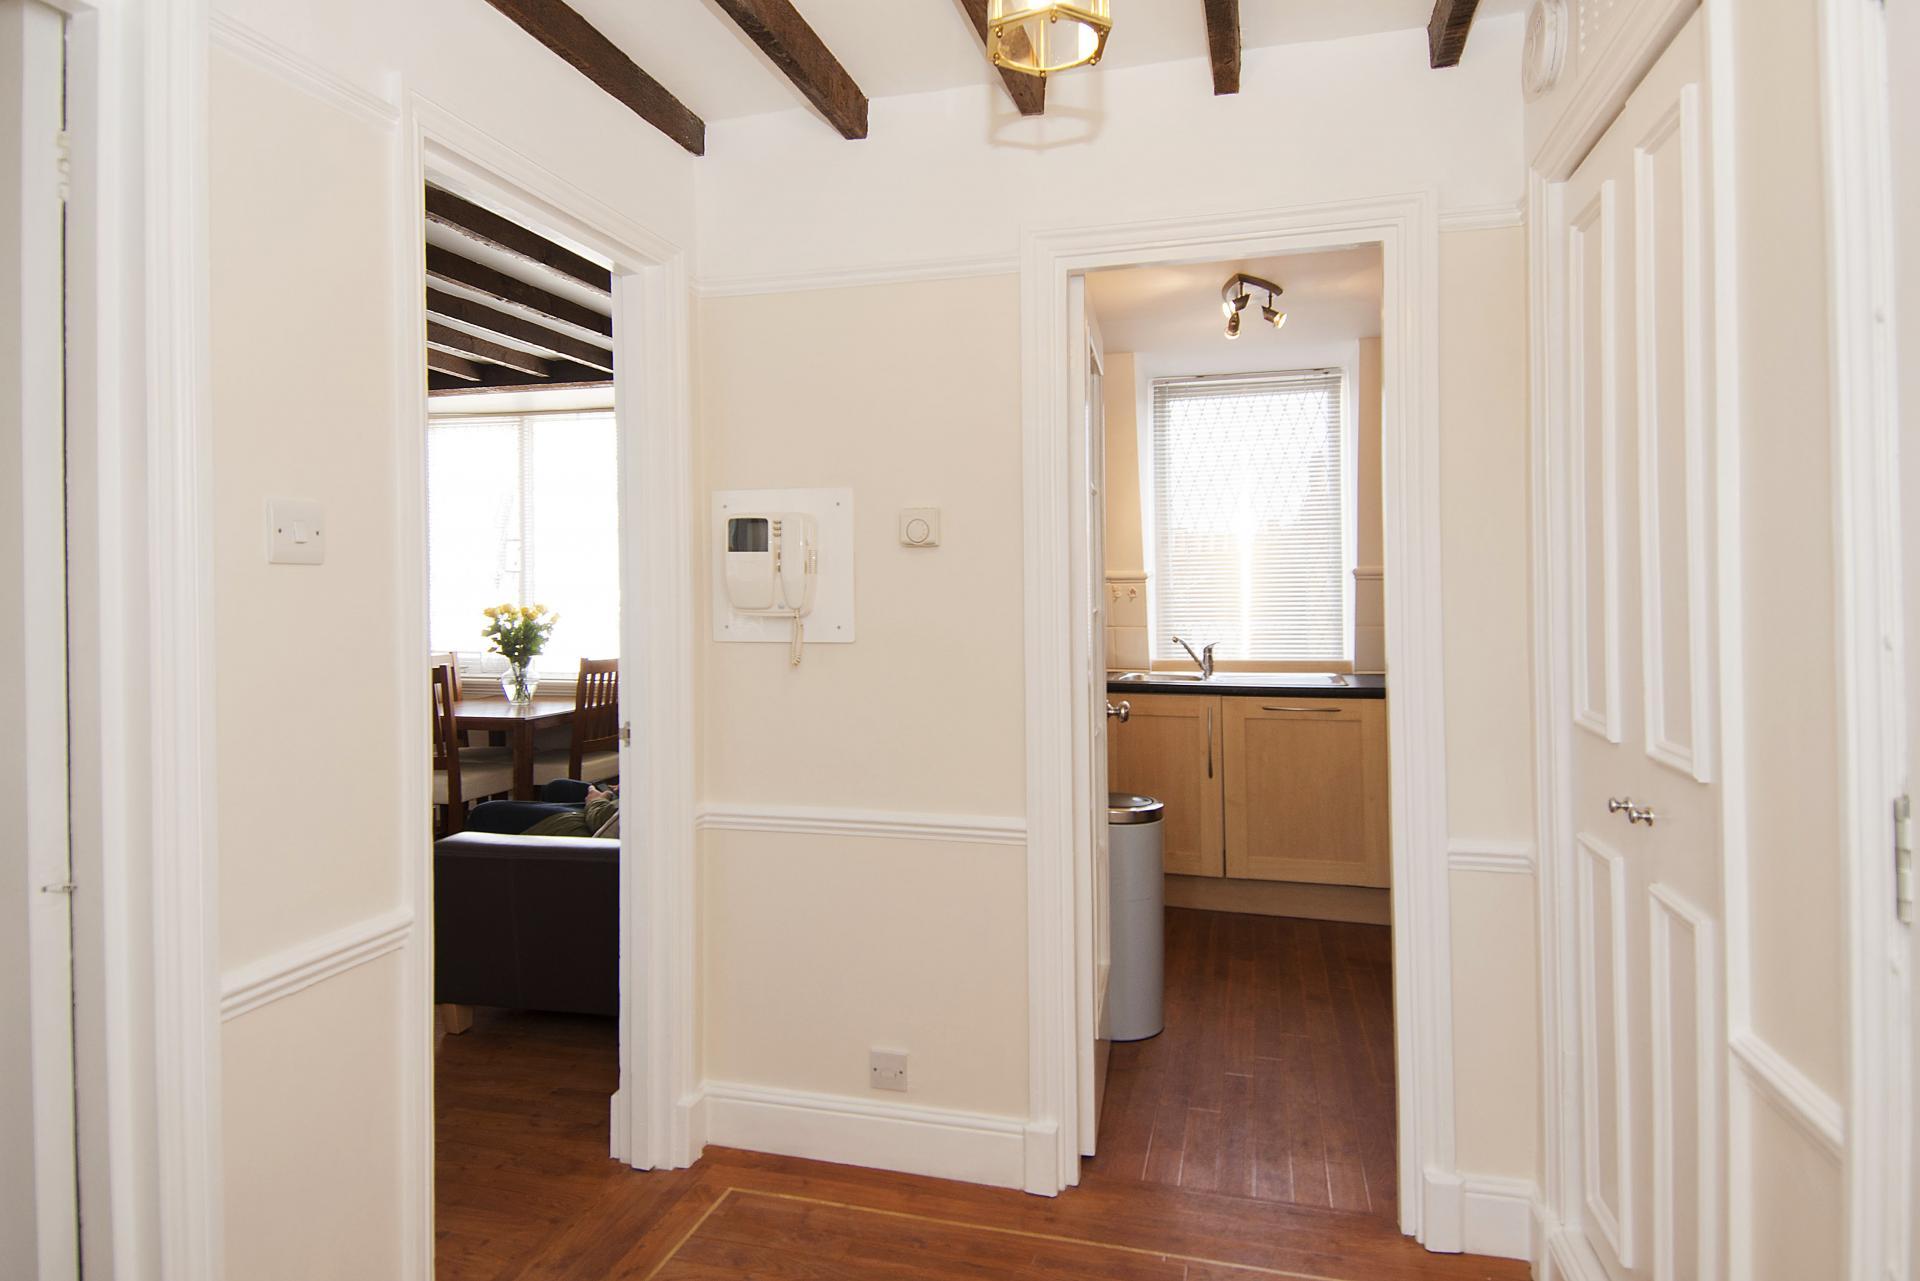 Hallway at Maybury Court Apartment - Citybase Apartments